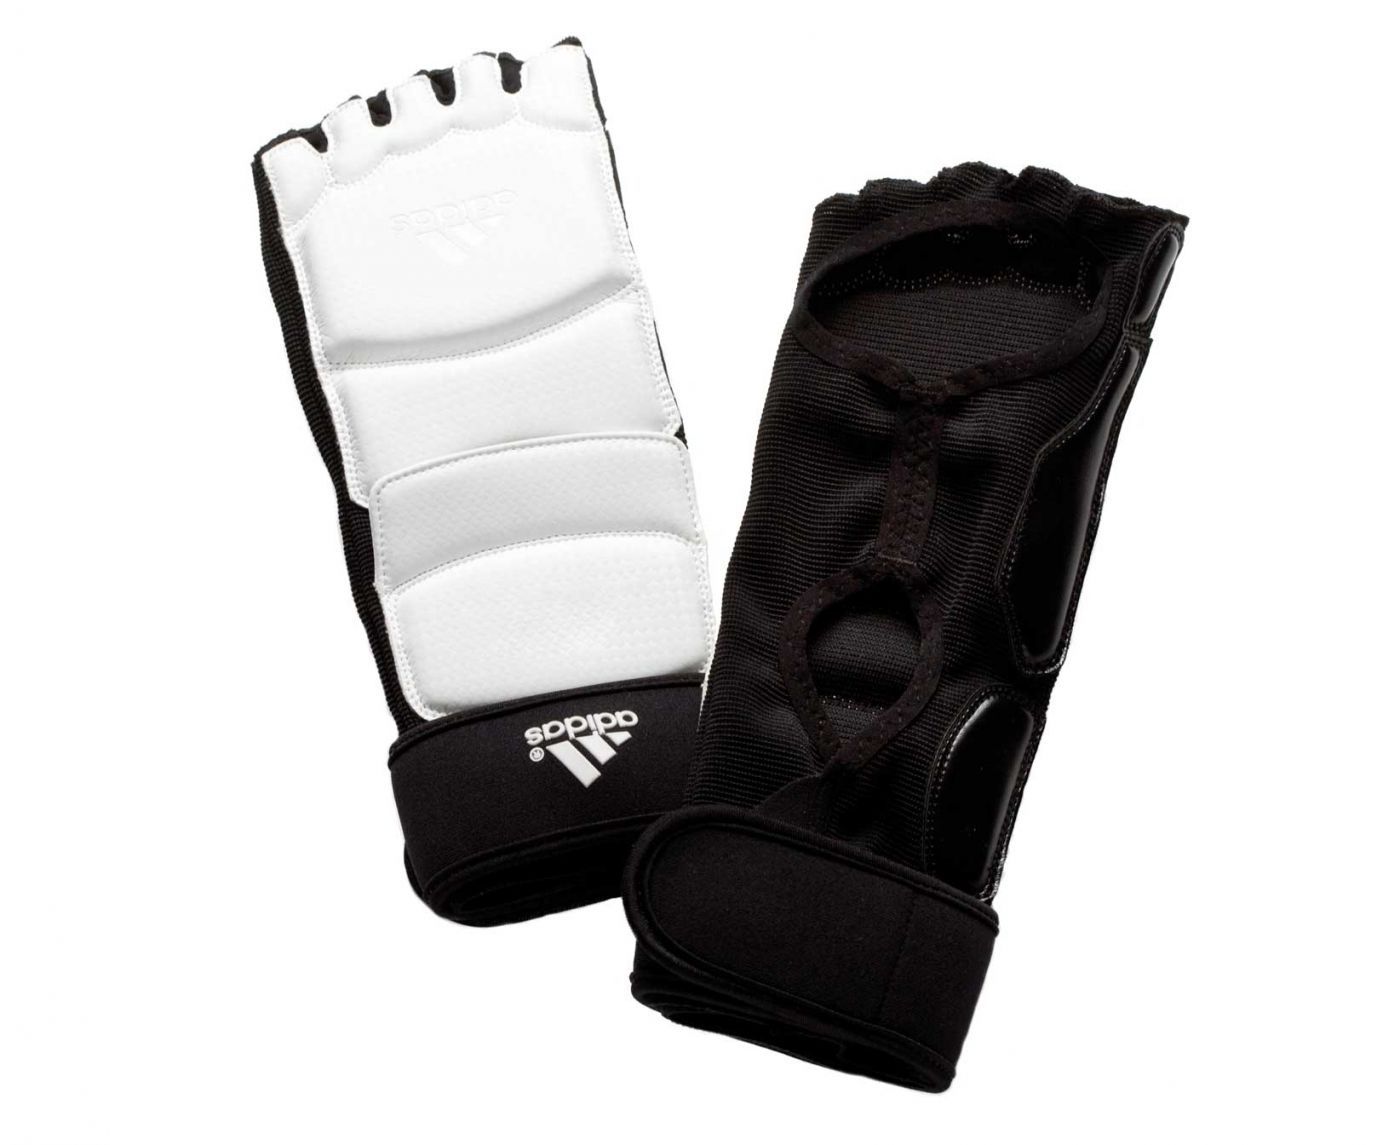 Защита стопы (футы), Adidas для тхэквондо WTF Foot Socks, белая, размер XL, артикул adiTFS01